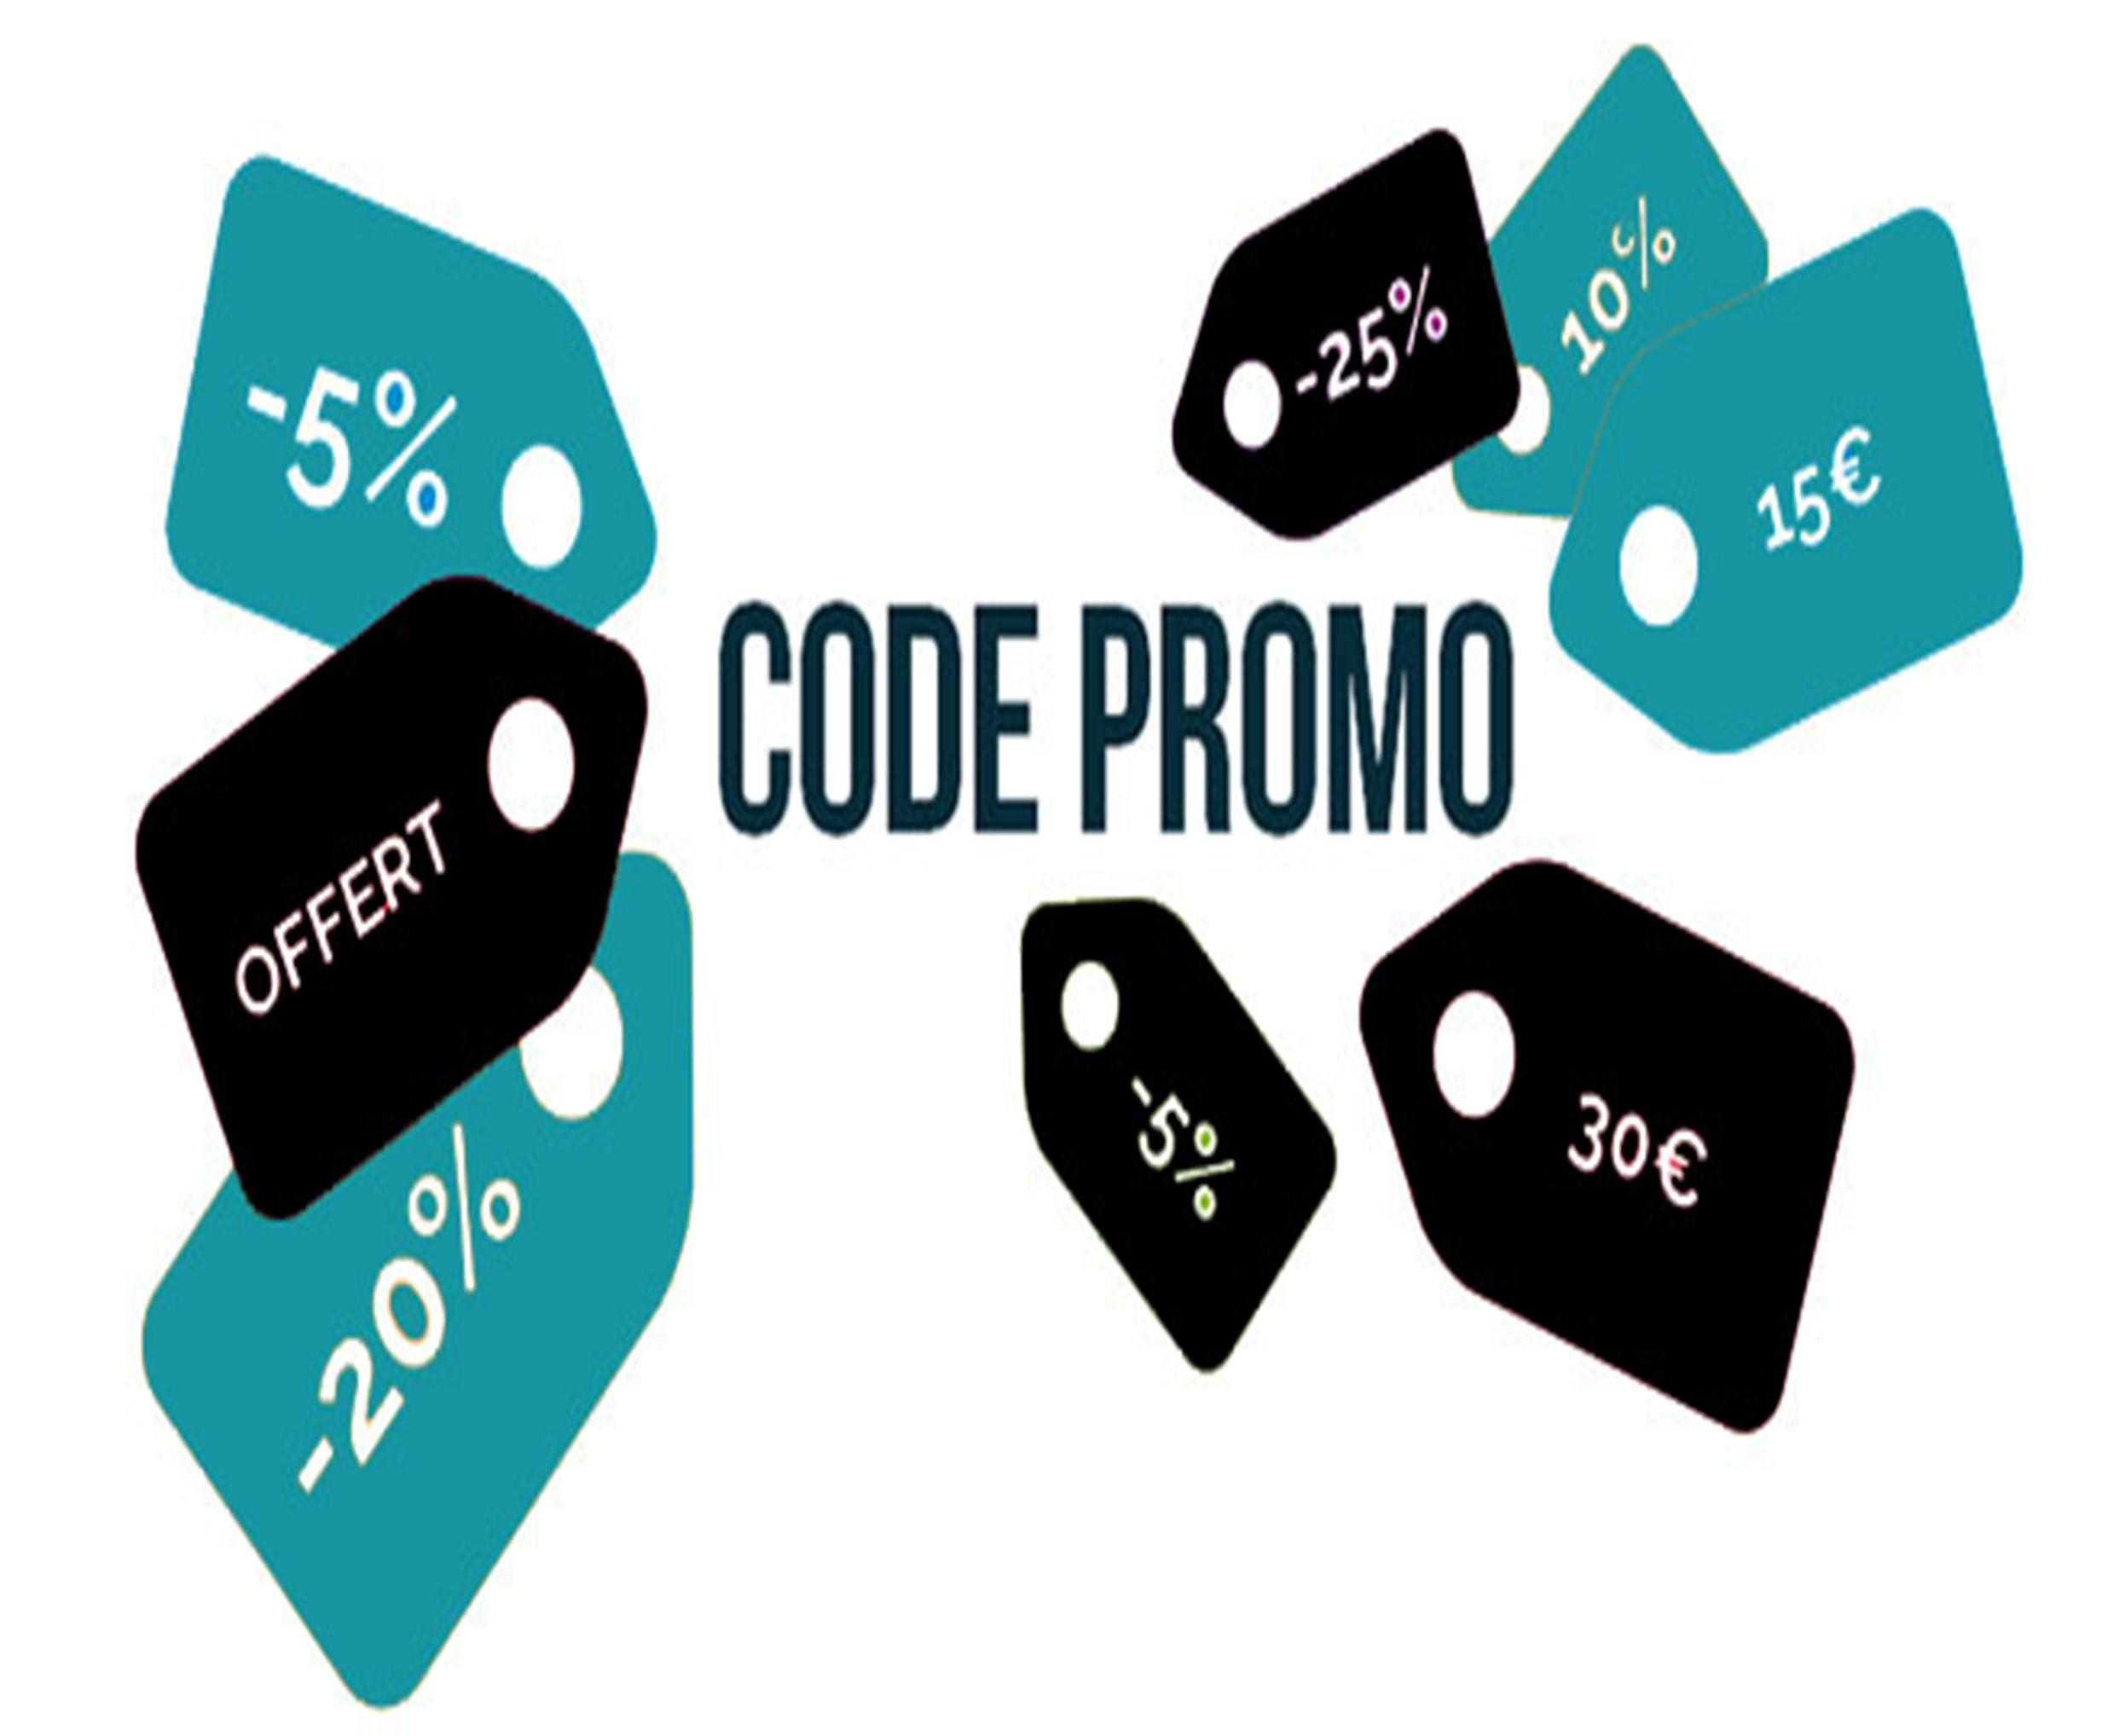 Quelle code promo ?